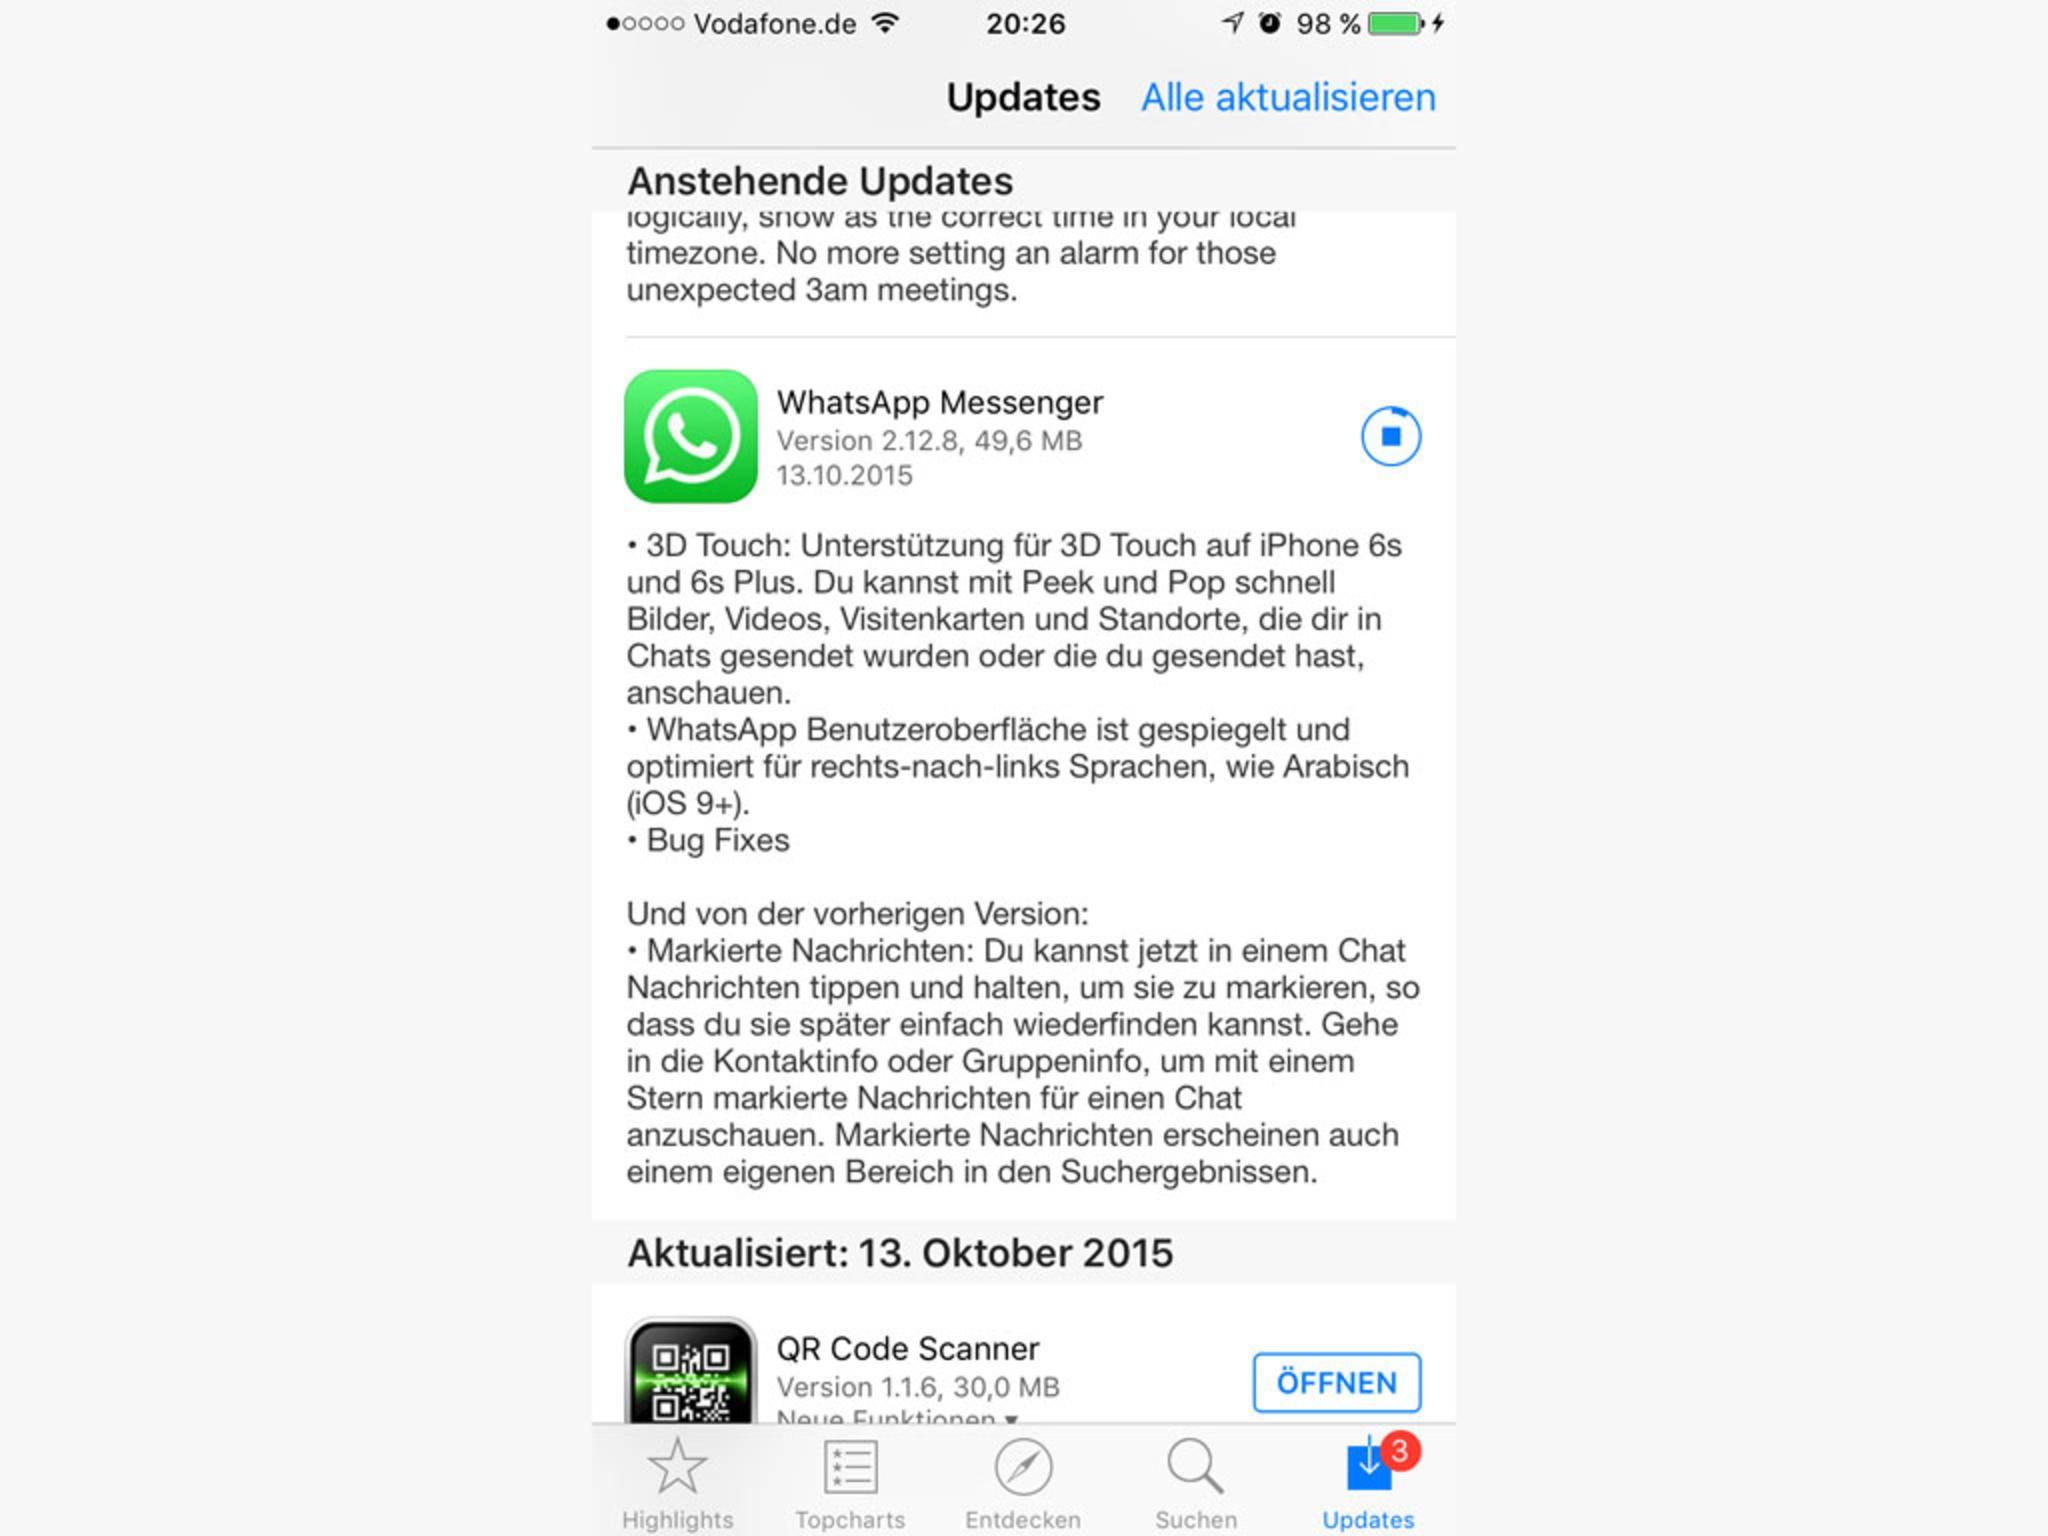 WhatsApp-Update-3Dtouch1